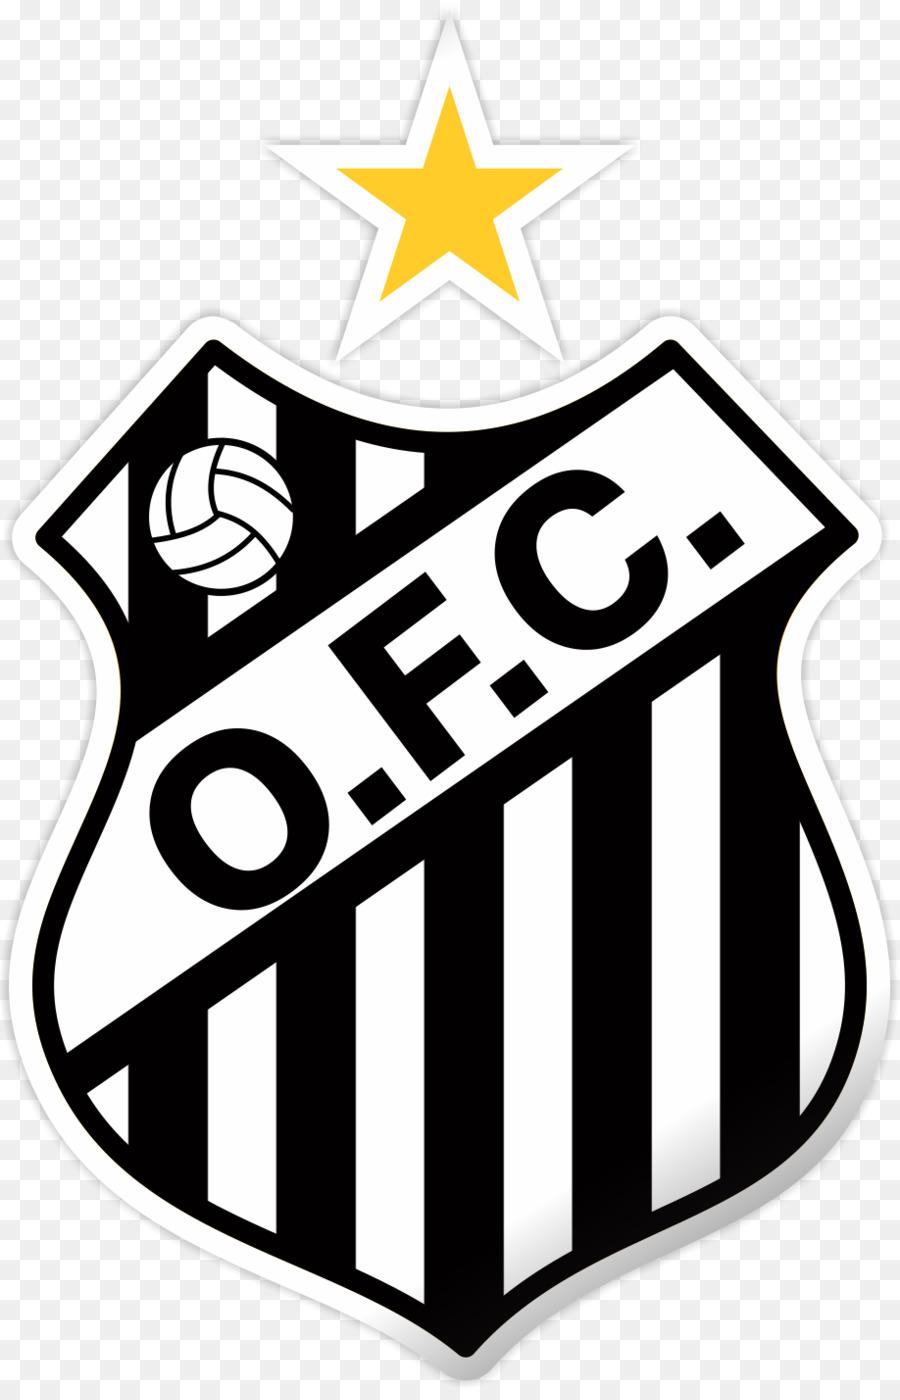 Novoperario Fussball Club Villa Nova Atletico Clube Hai